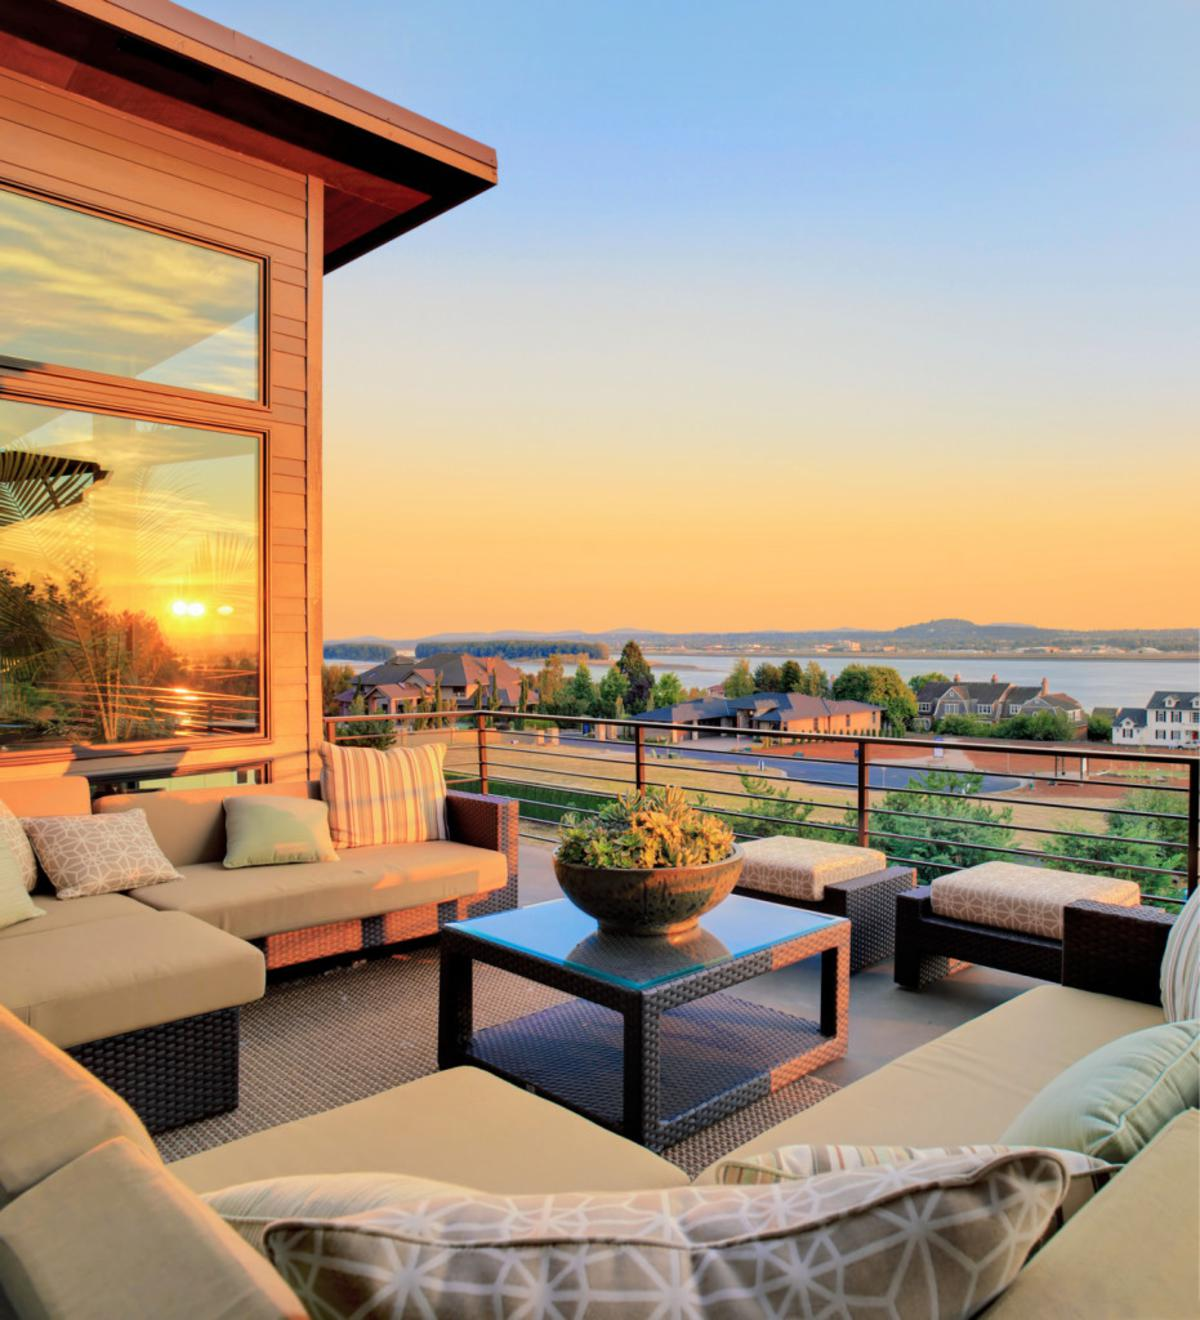 Summer Patios for Open-Air Living